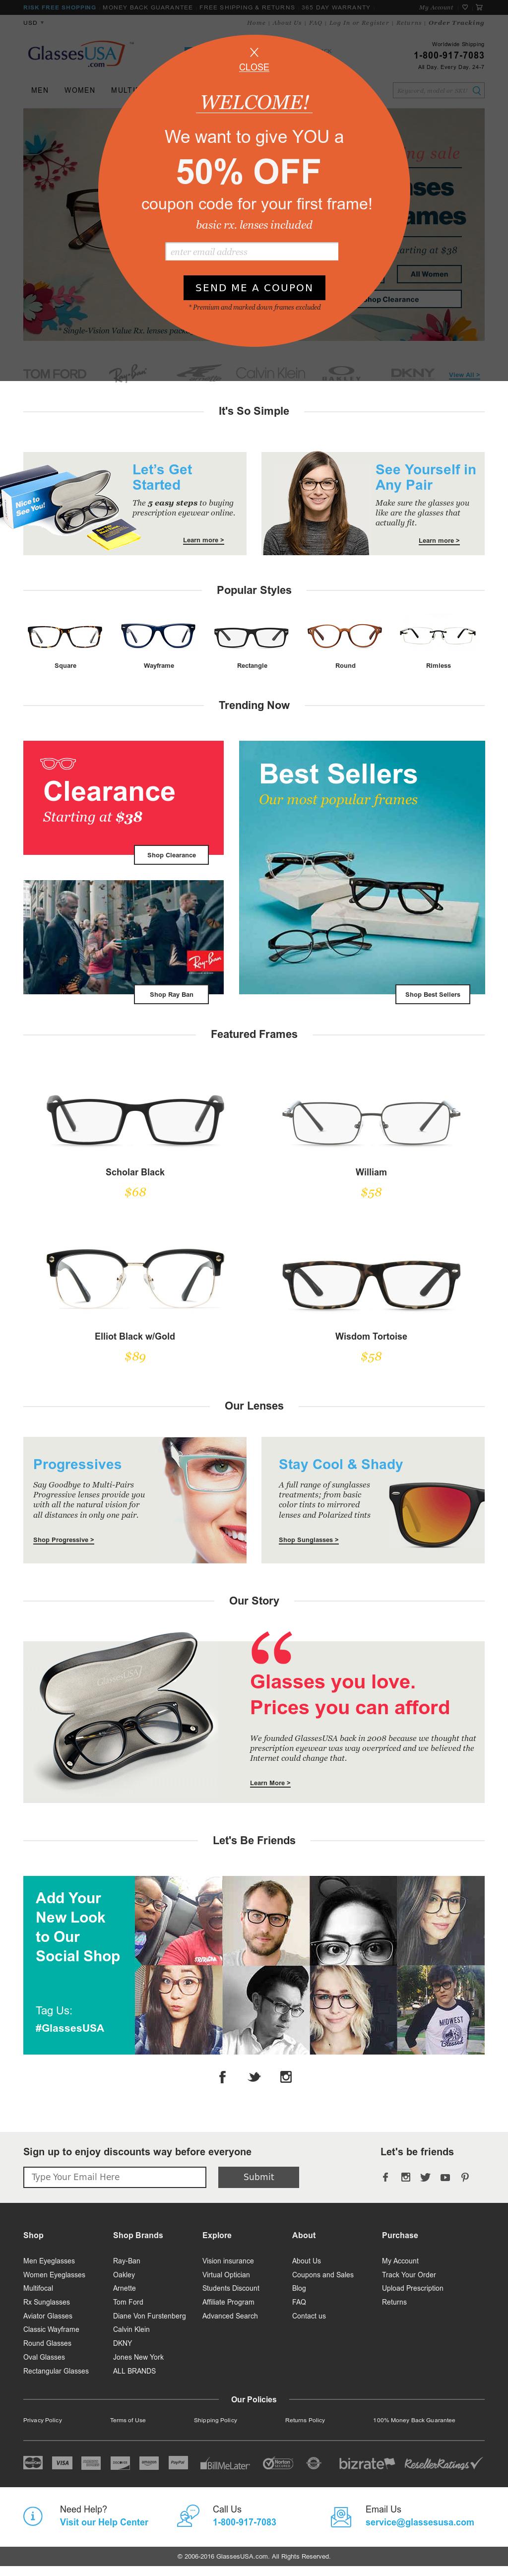 d371c014116 GlassesUSA Competitors